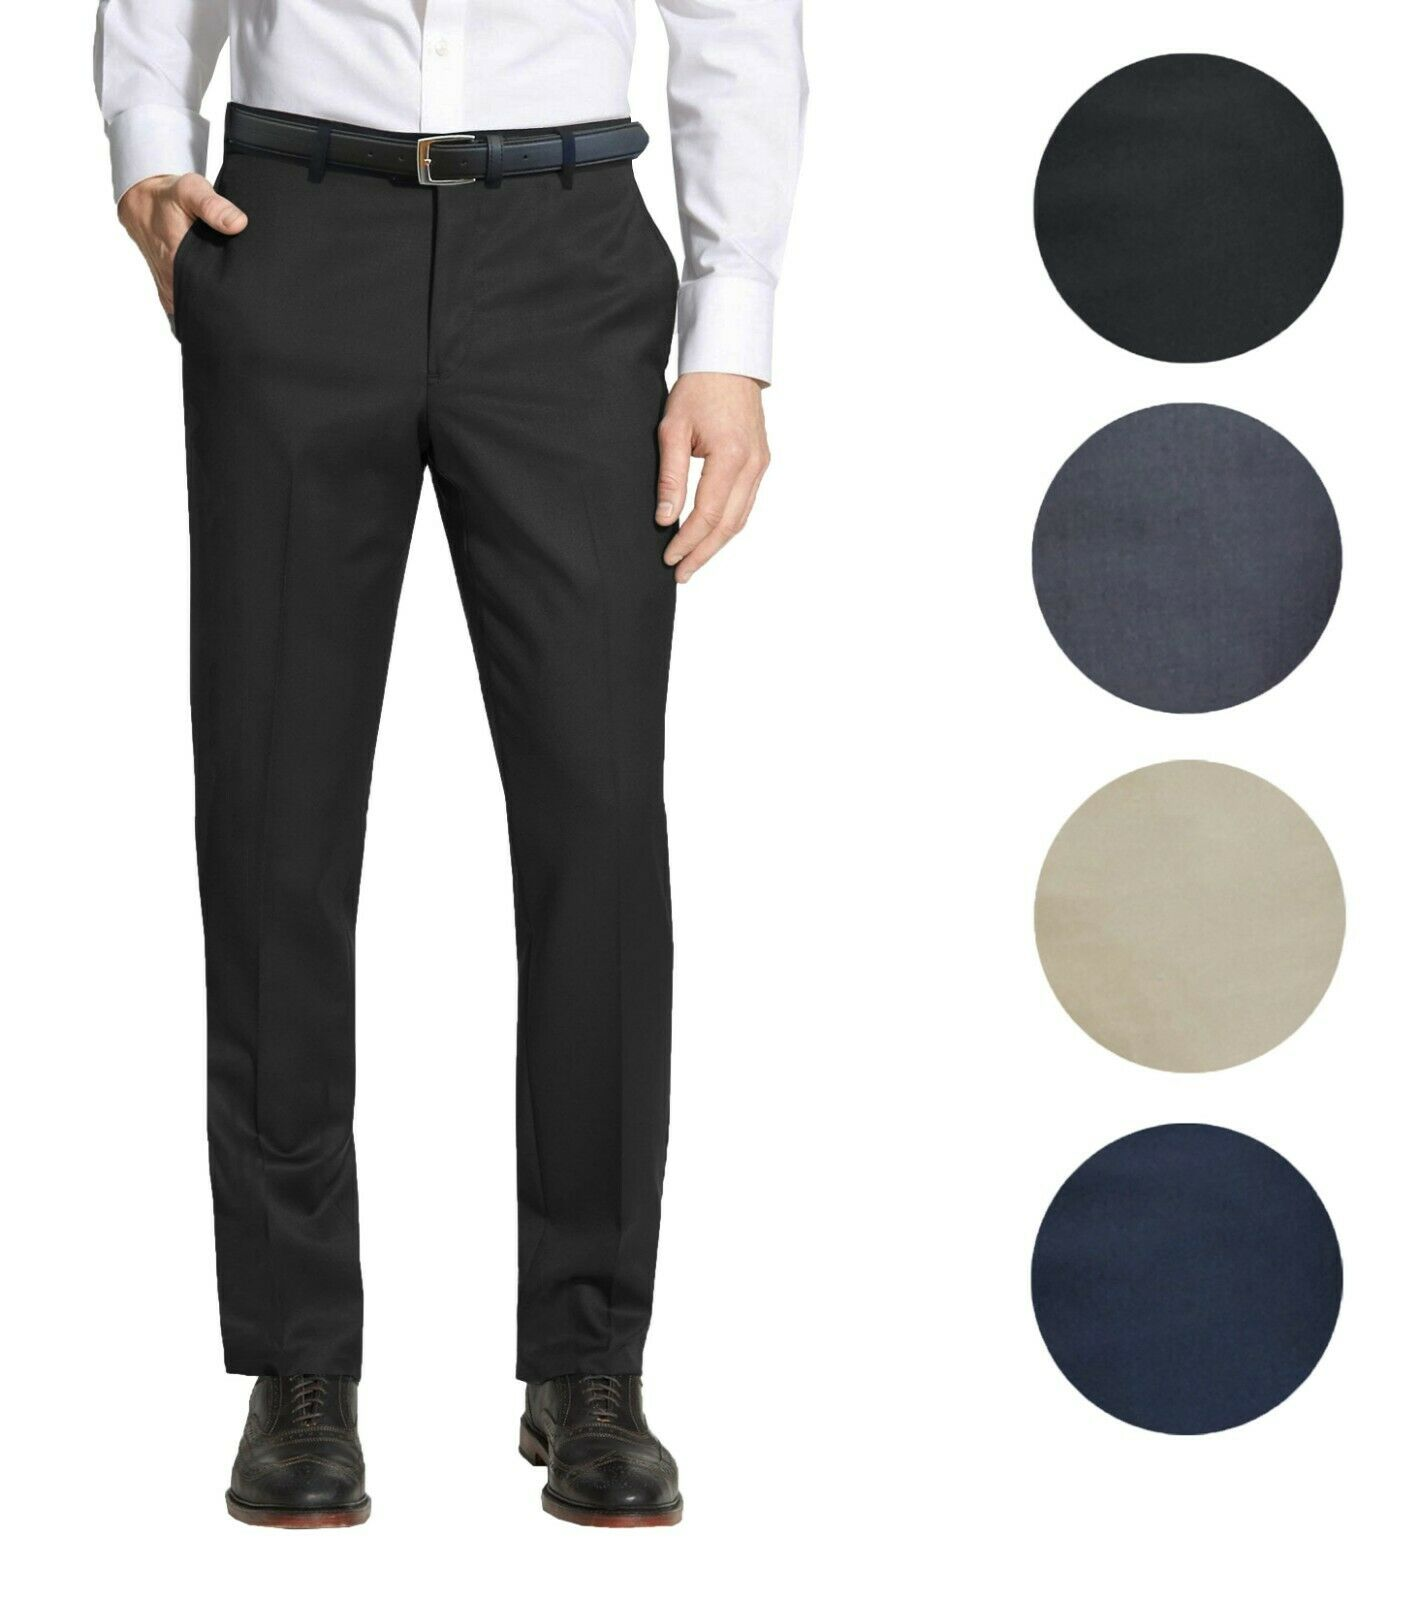 Mens Belted Slim Fit Dress Pants Flat Front Multiple Colors